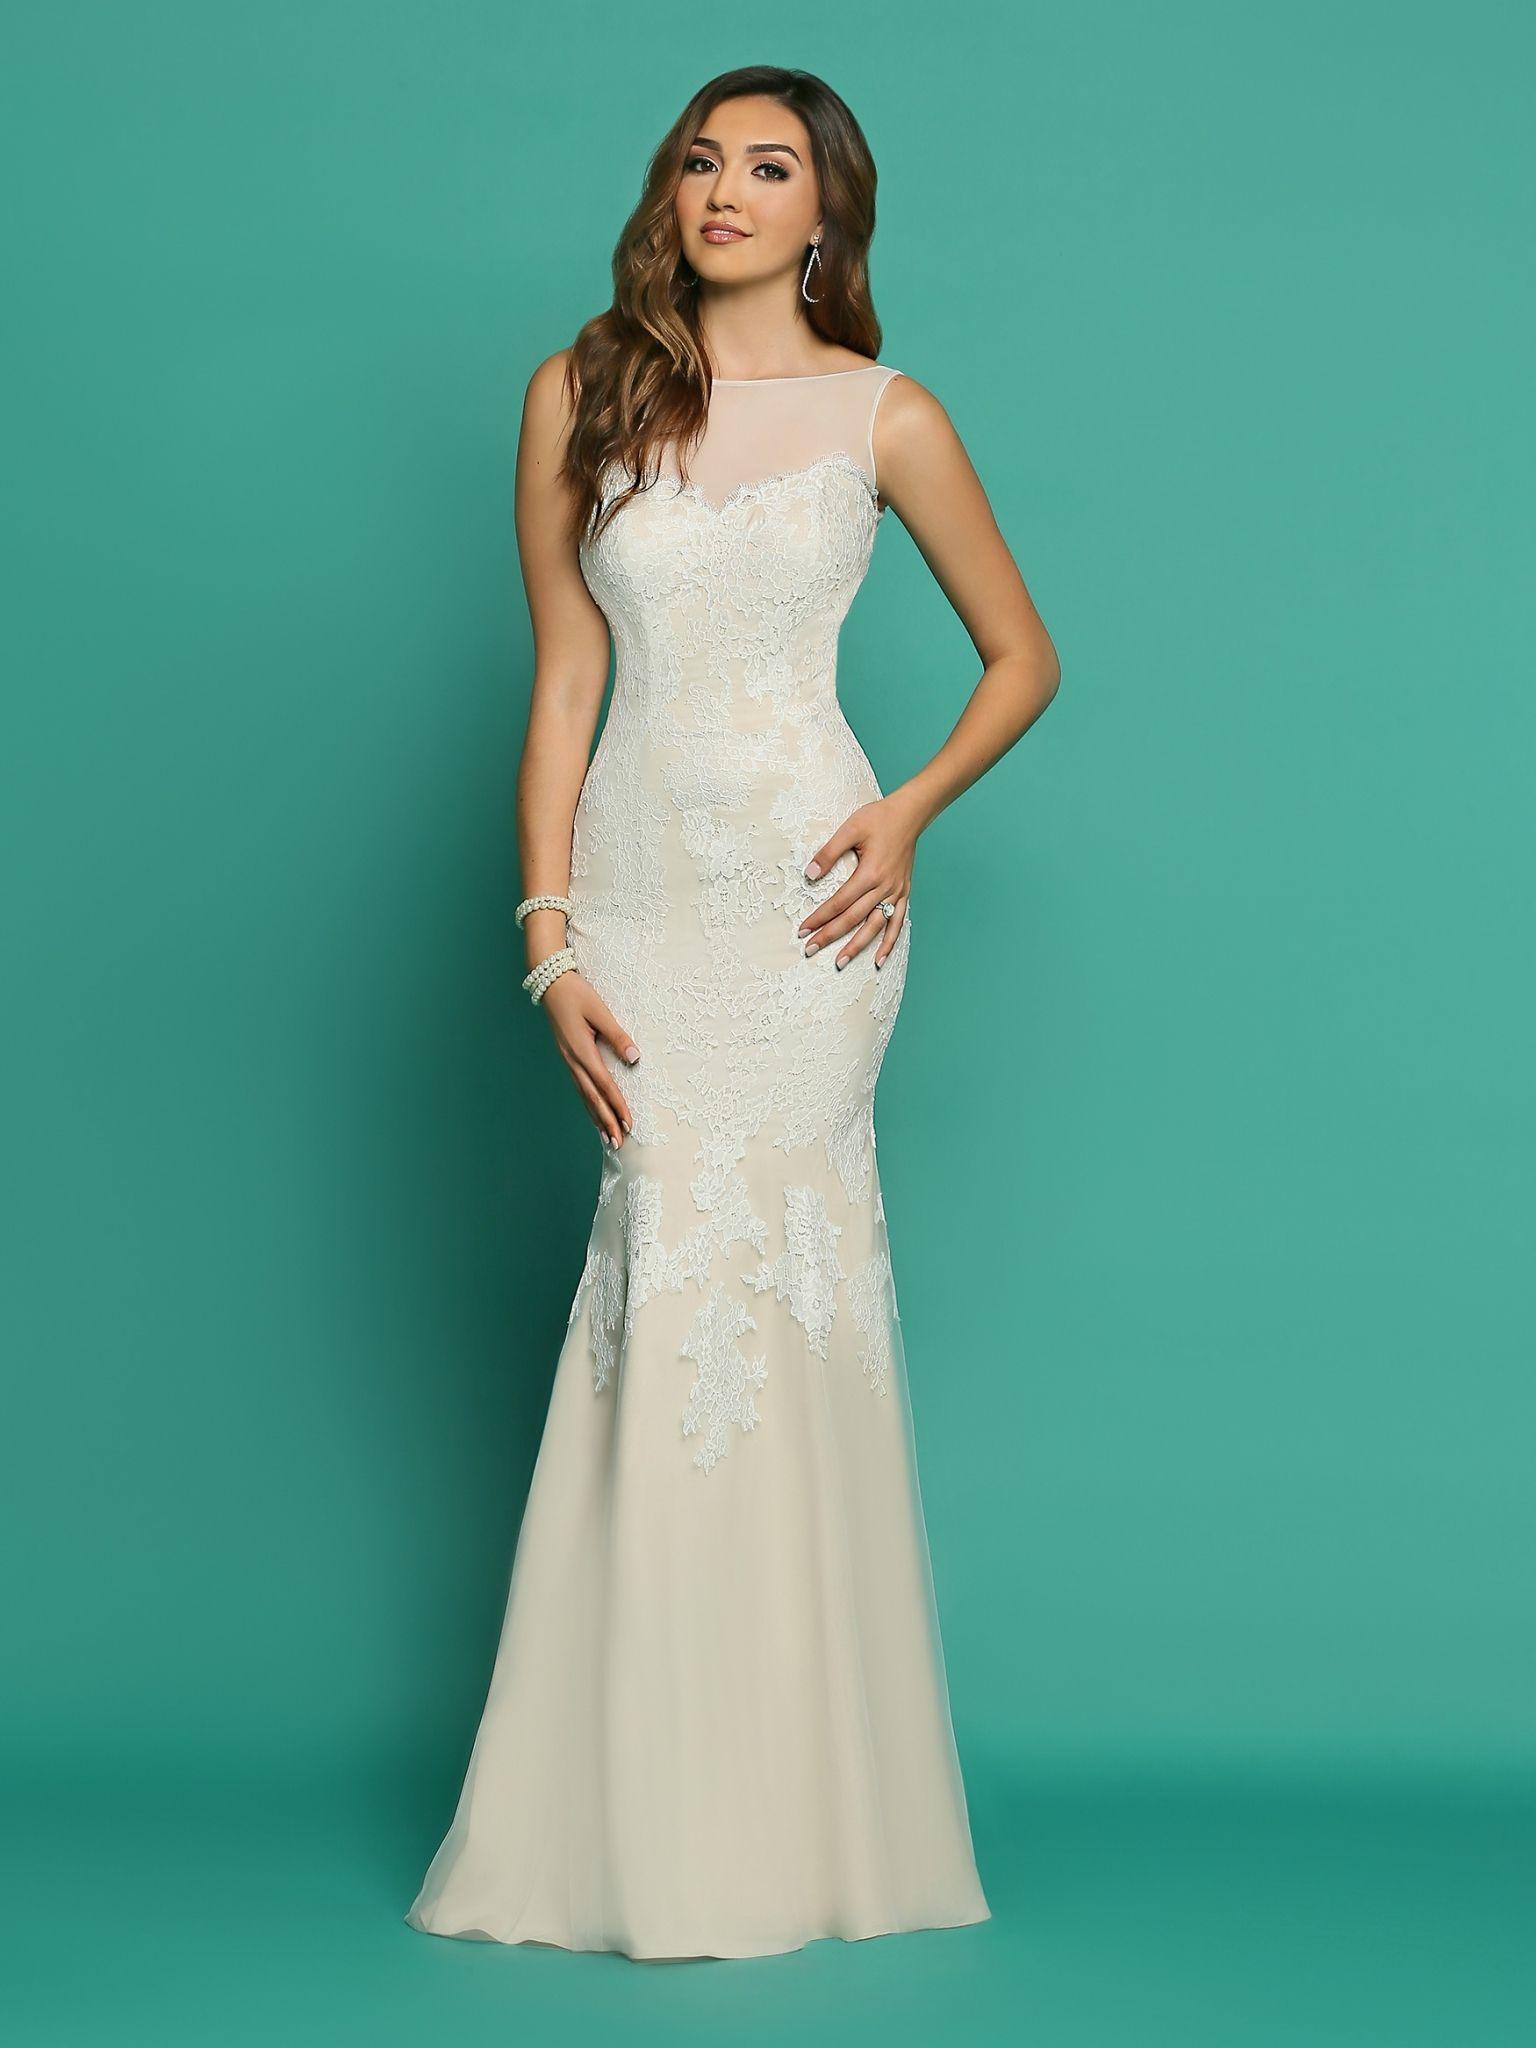 simple informal wedding dress - dressy dresses for weddings Check ...